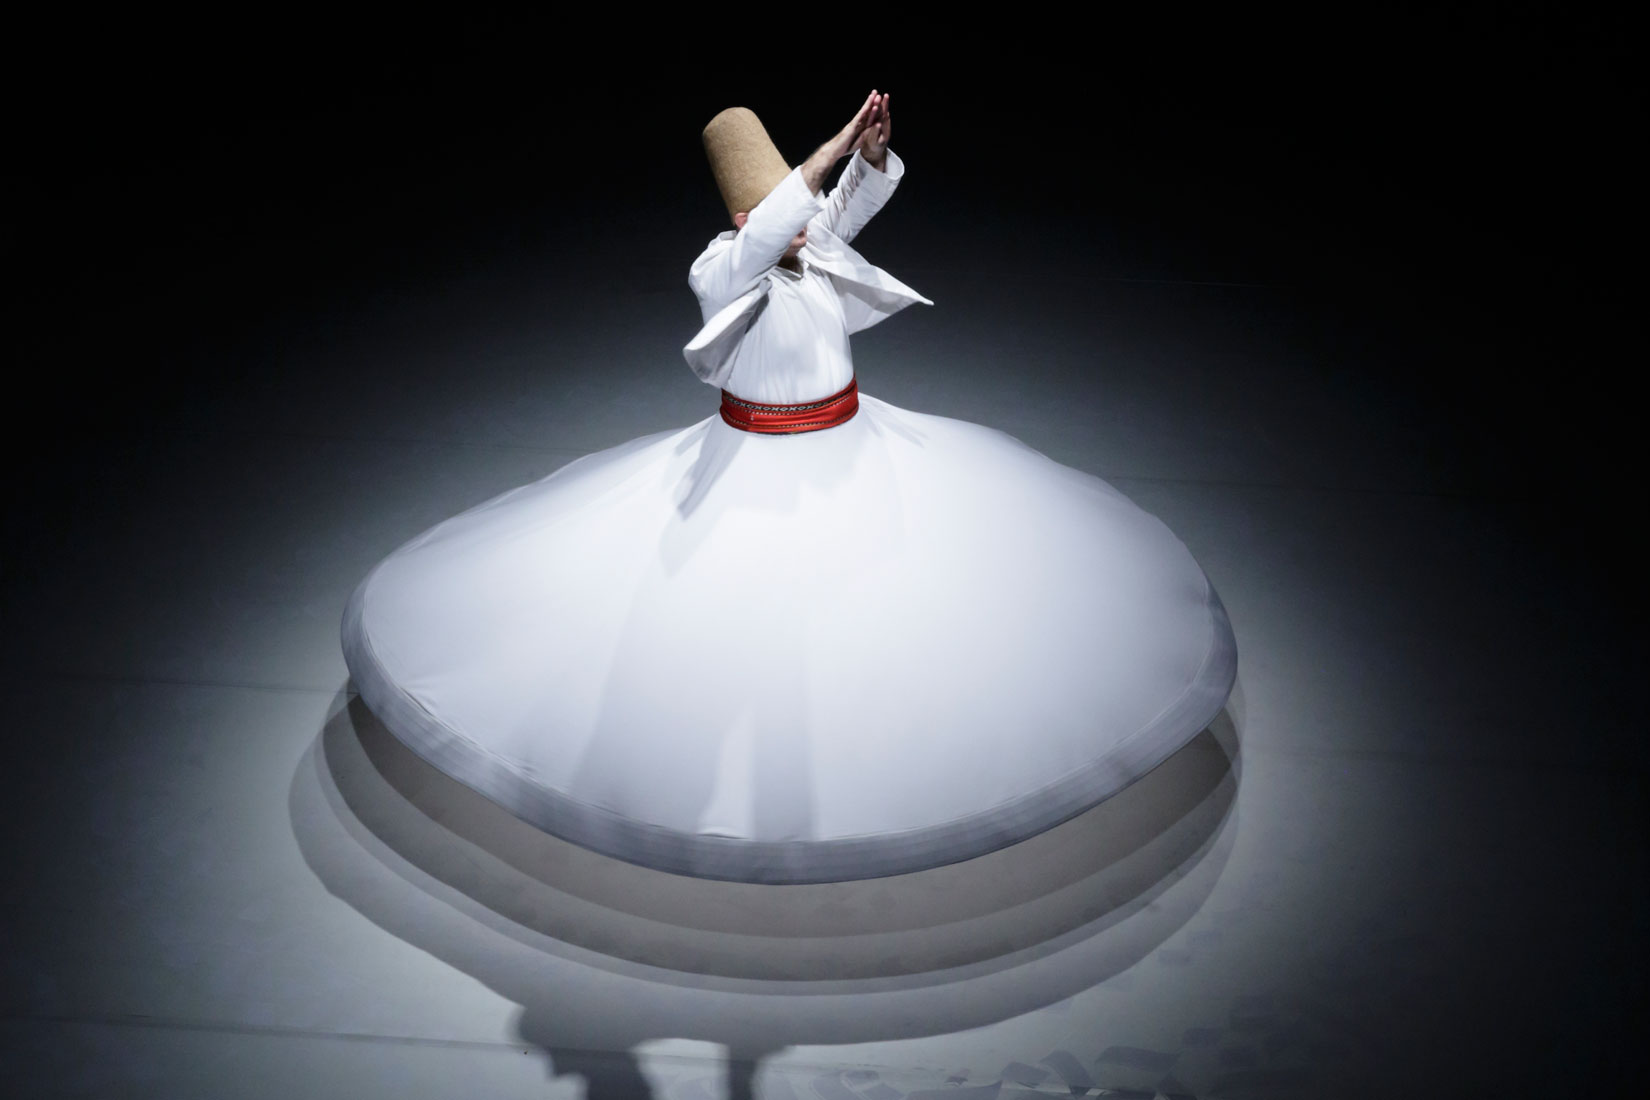 White spirit une cr ation au mus e du quai branly for Utilisation du white spirit